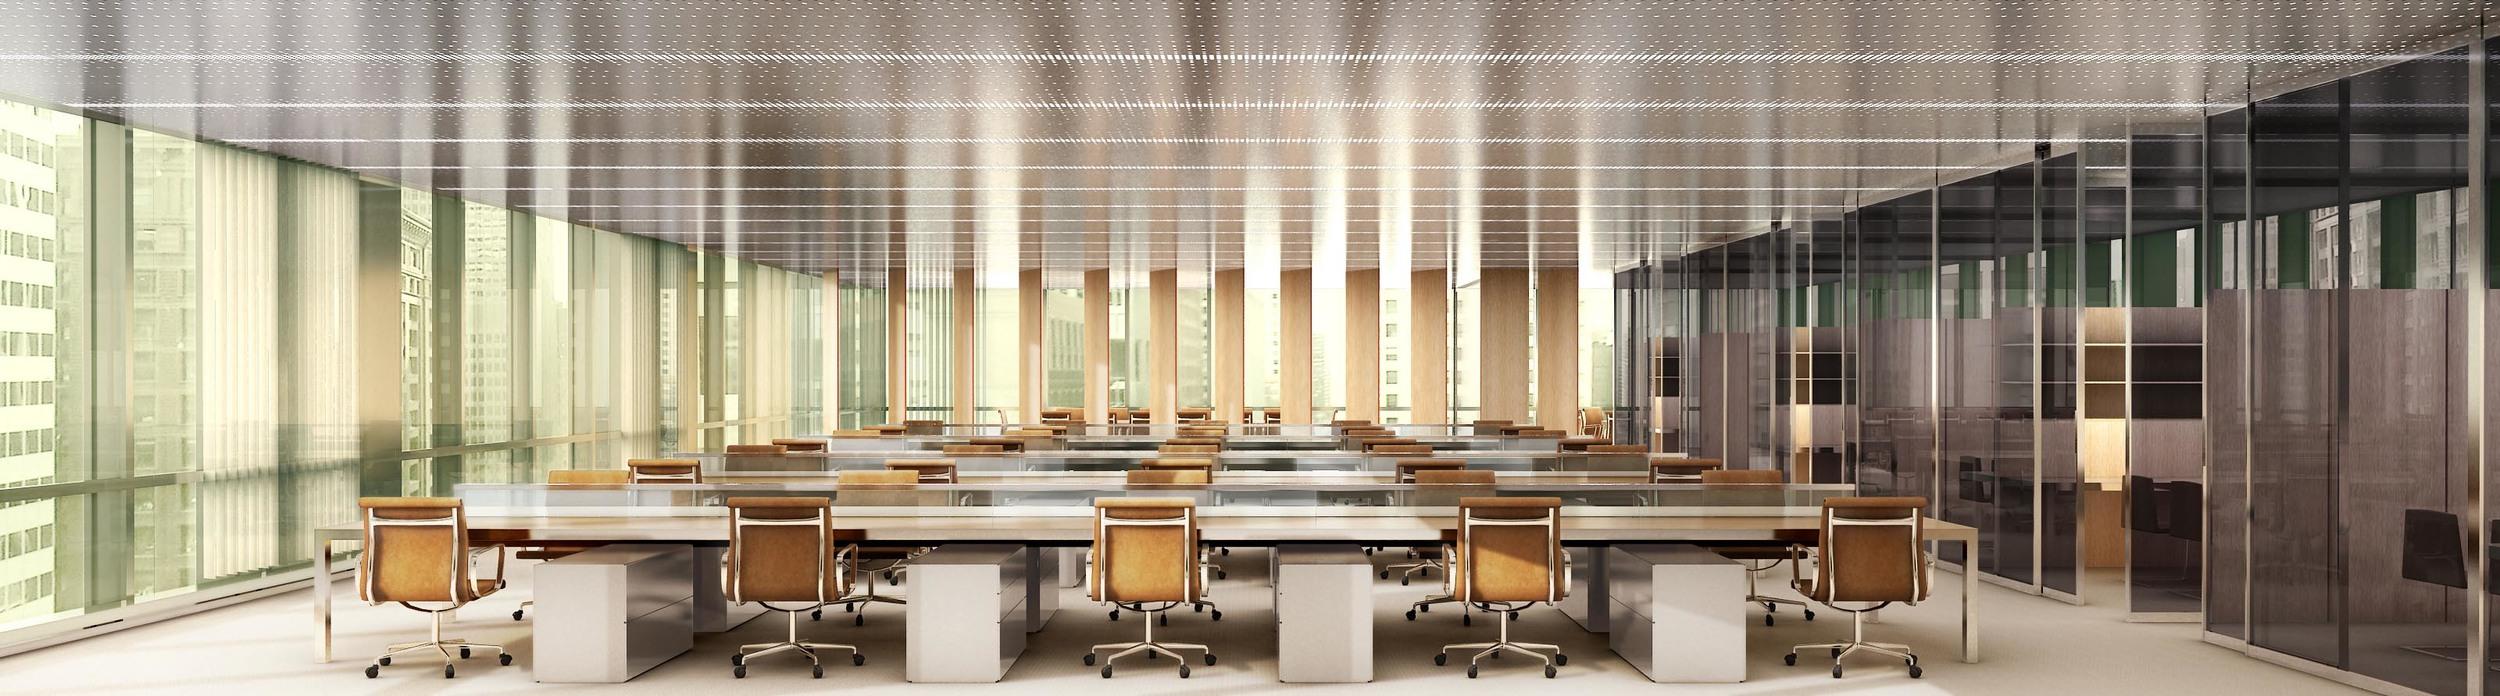 Office Hotel Interior _ Light Palette